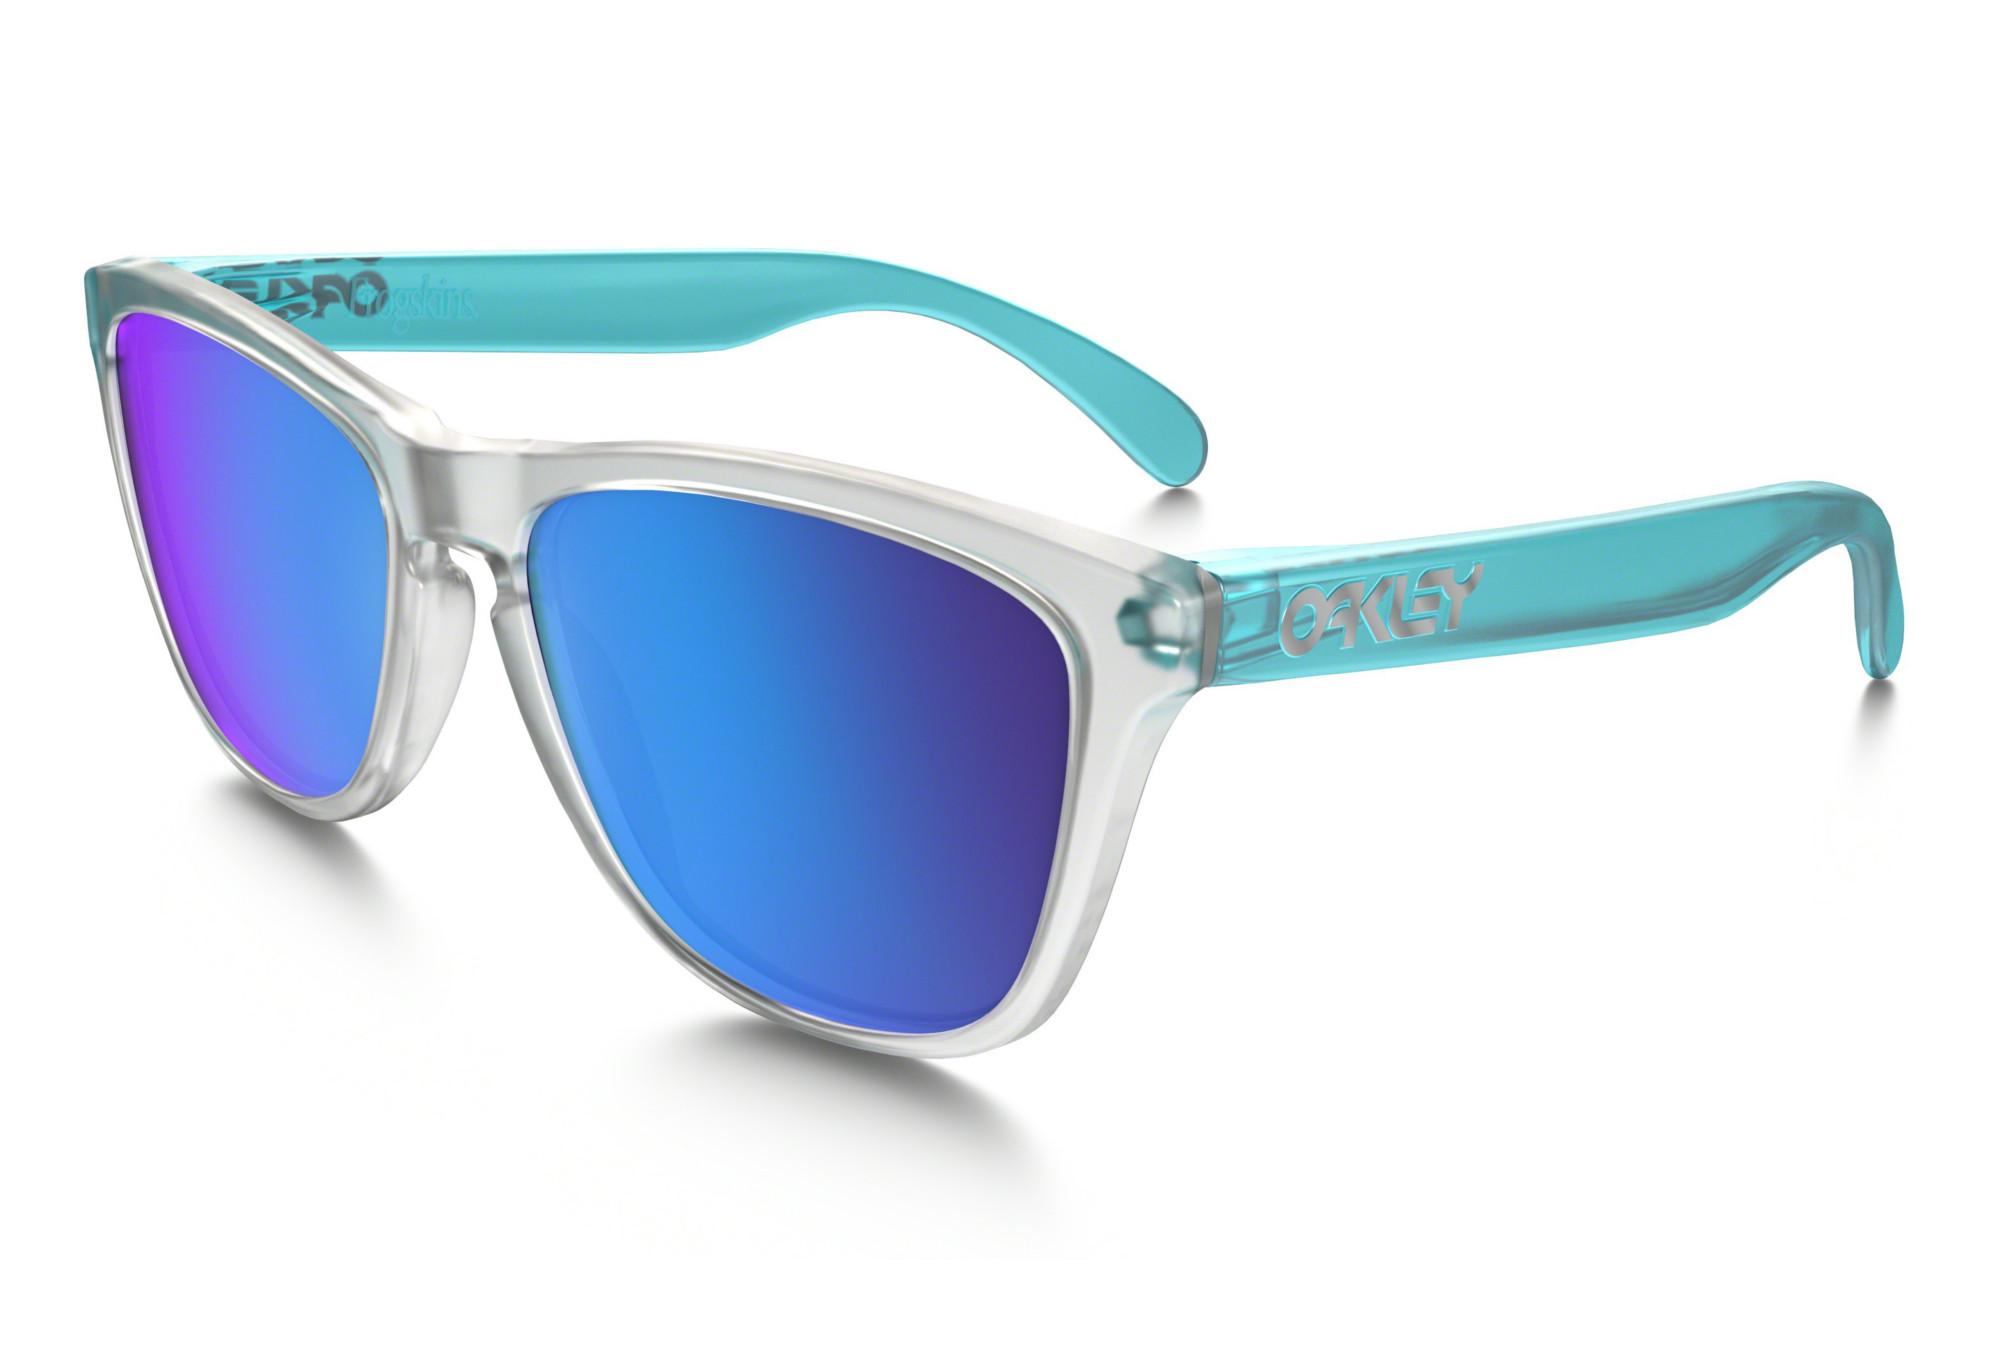 7530968ee7c OAKLEY Sunglasses Frogskins Clear Blue Sapphire Iridium Ref OO9013-B255